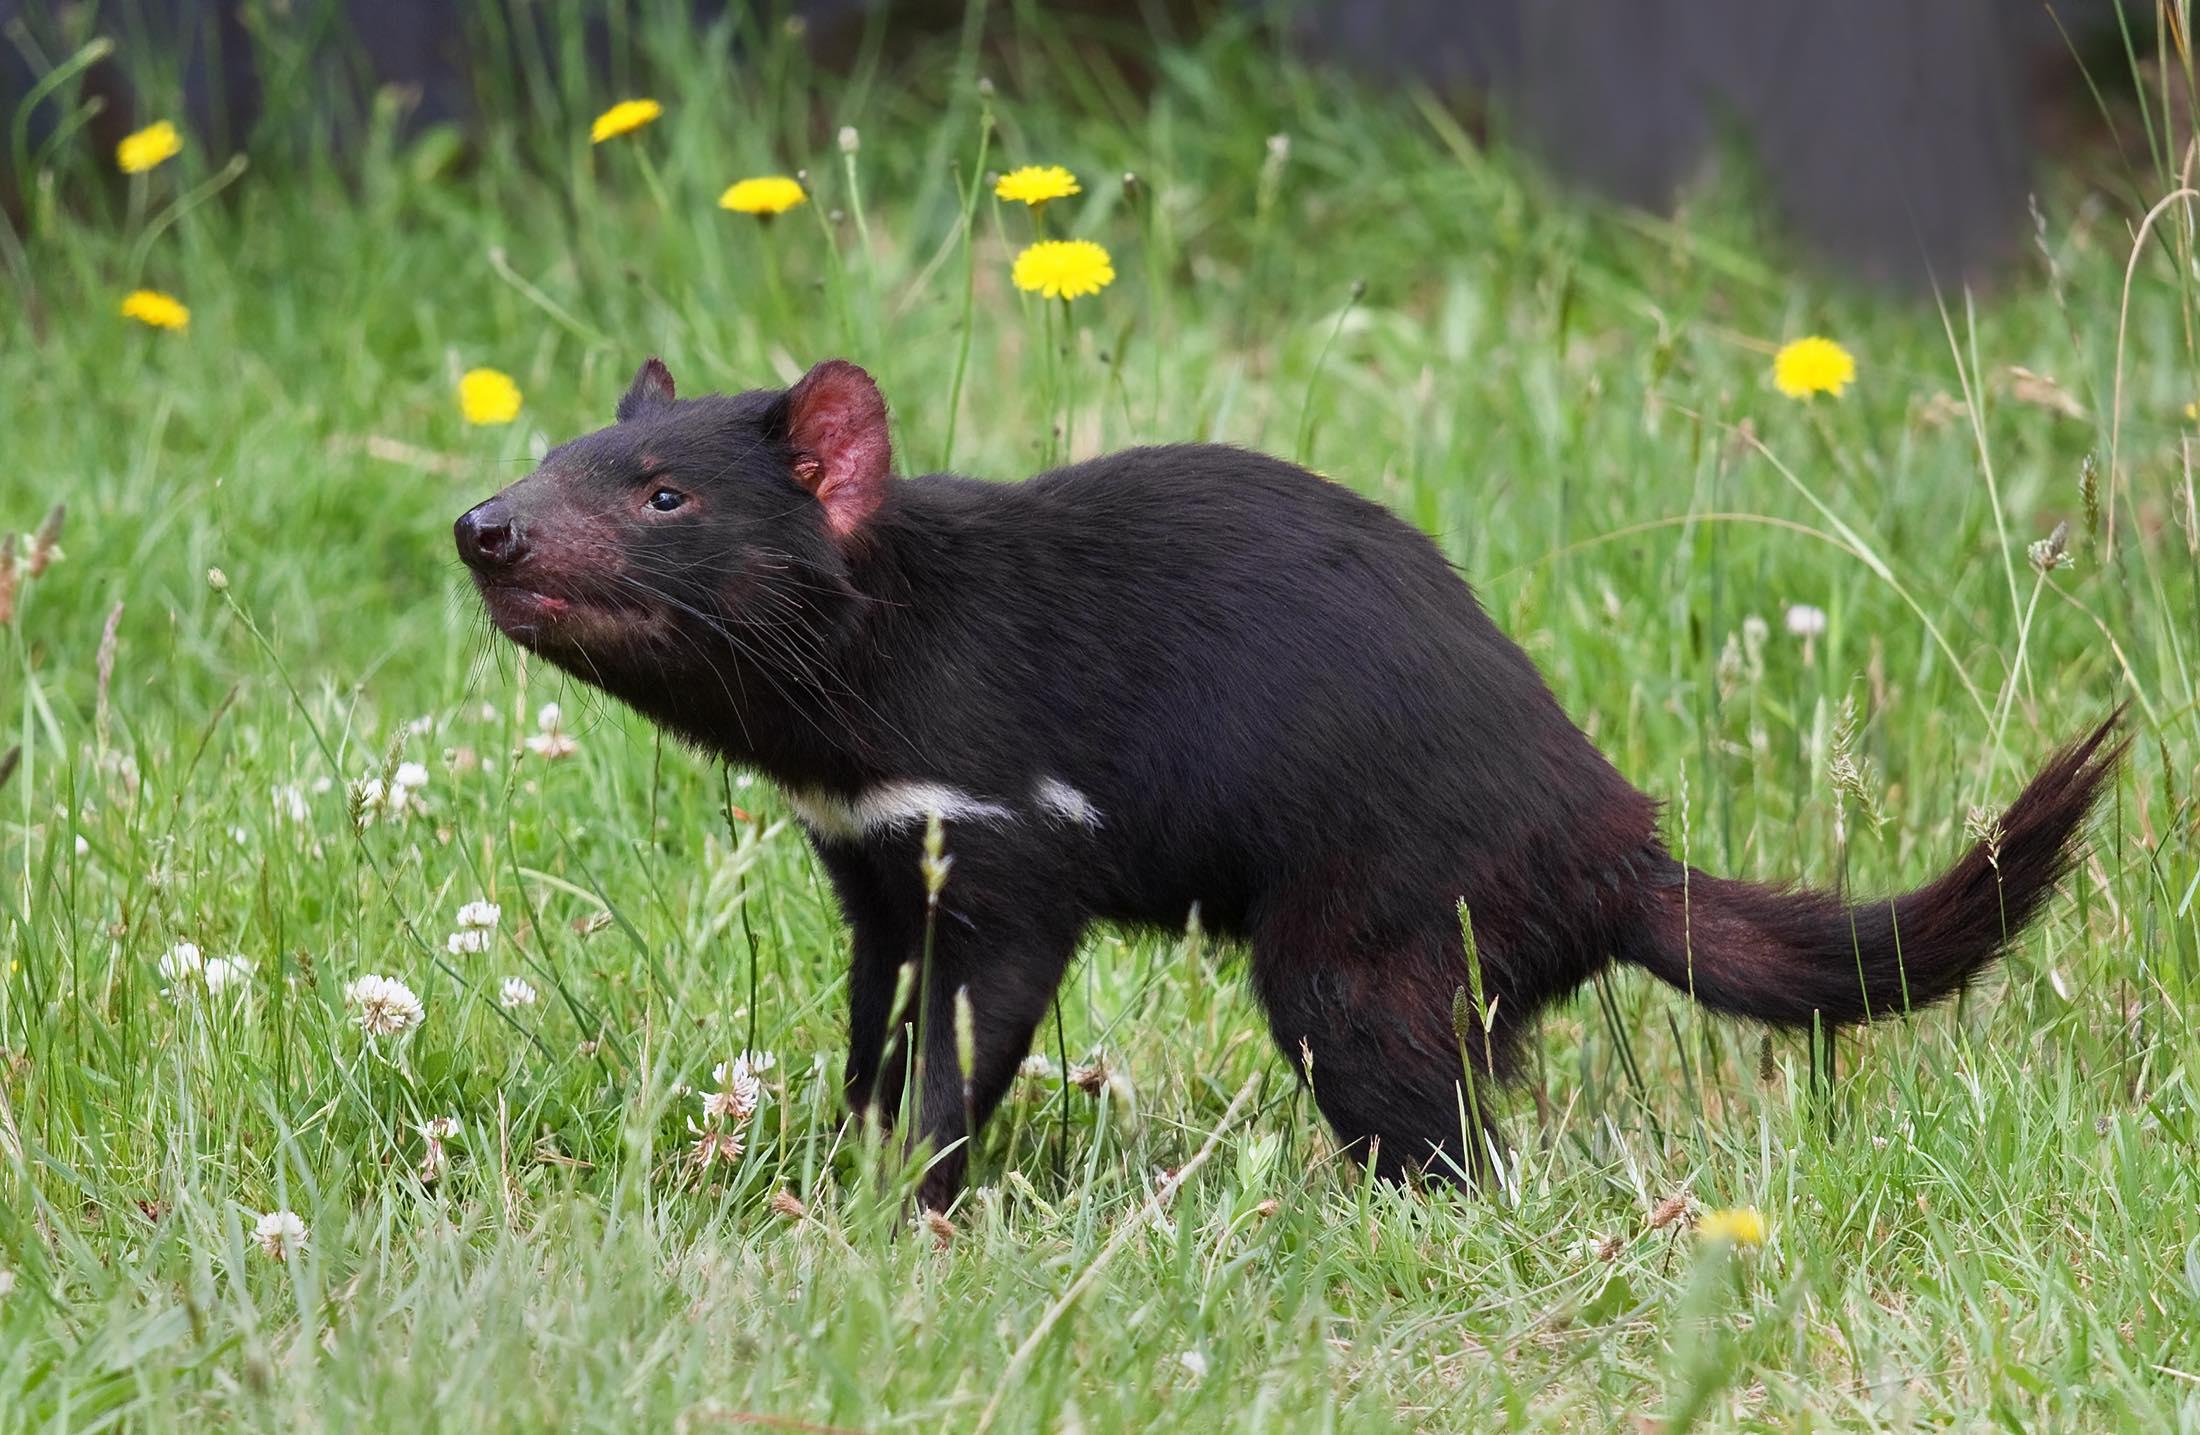 Tasmanian devil (Sarcophilus harrisii). Photo by JJ Harrison, Wikimedia Commons.